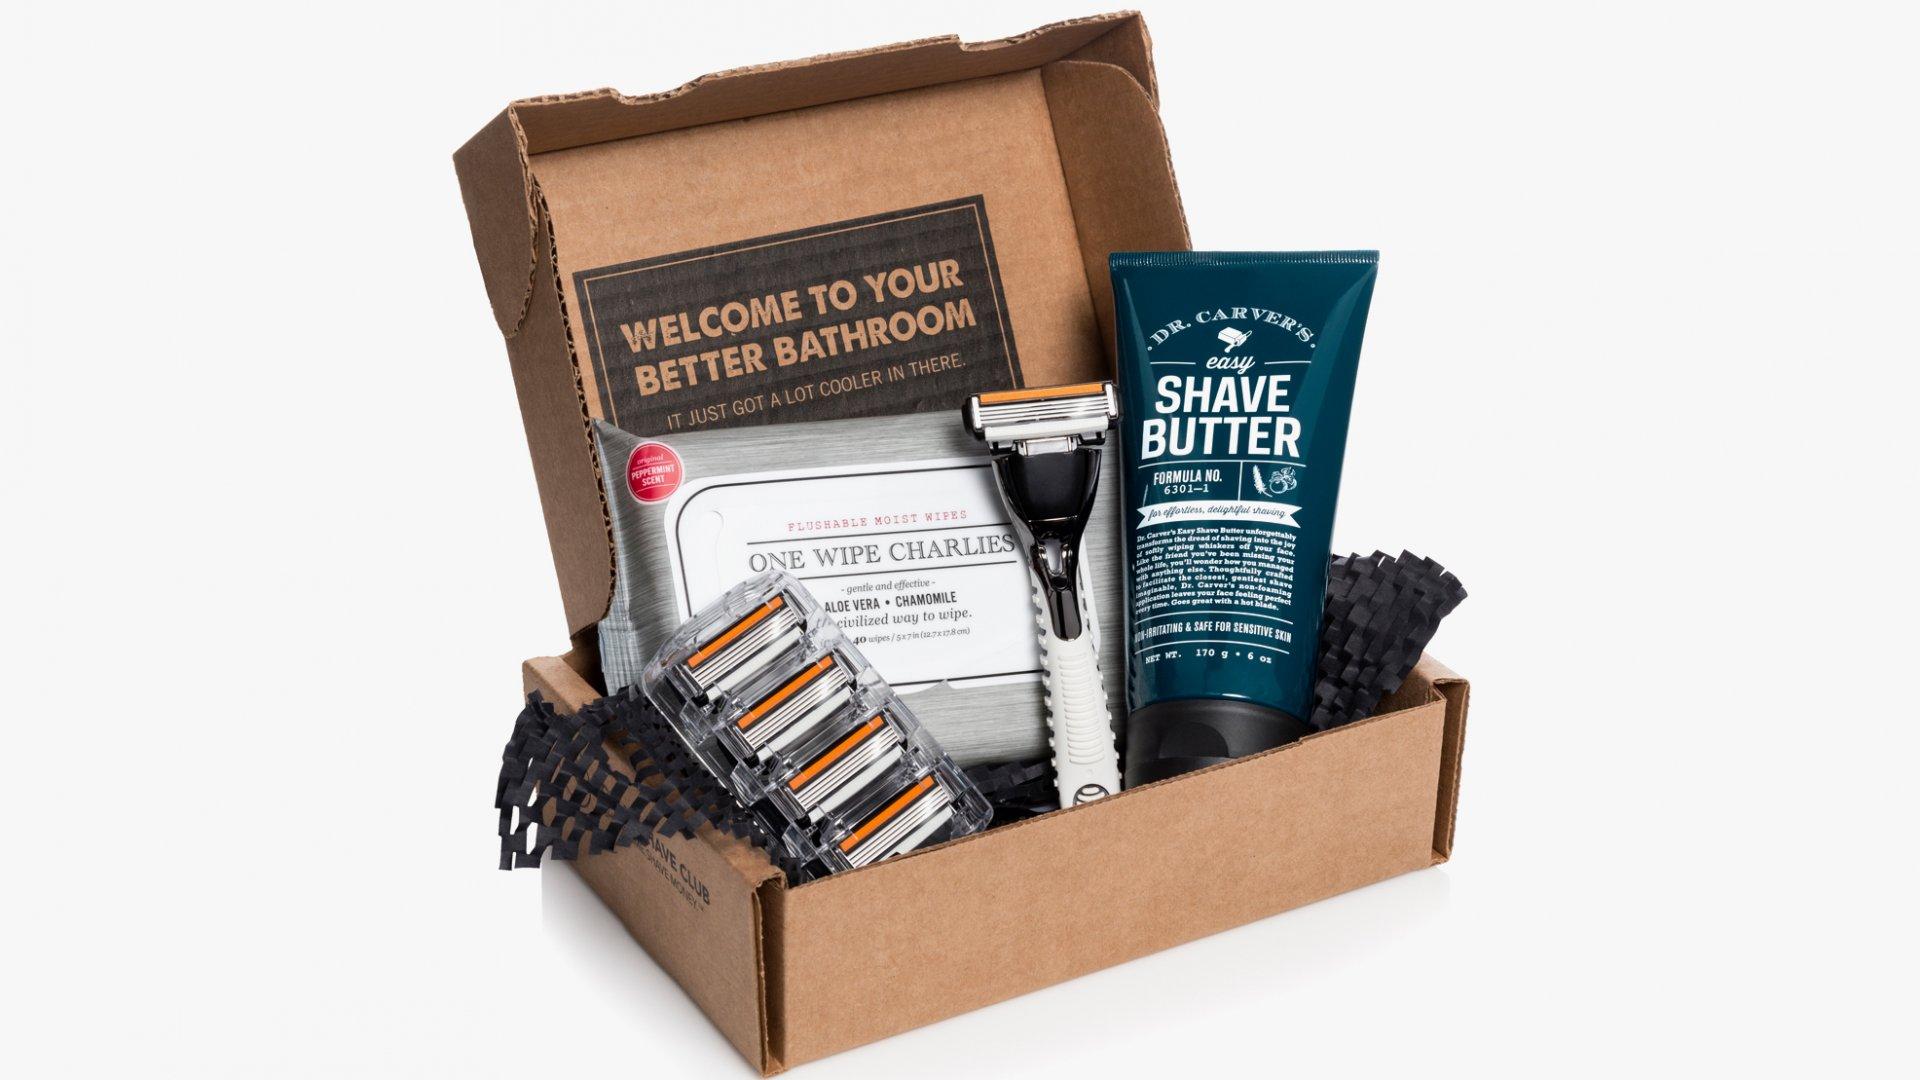 Gillette Suing Dollar Shave Club for Patent Infringement